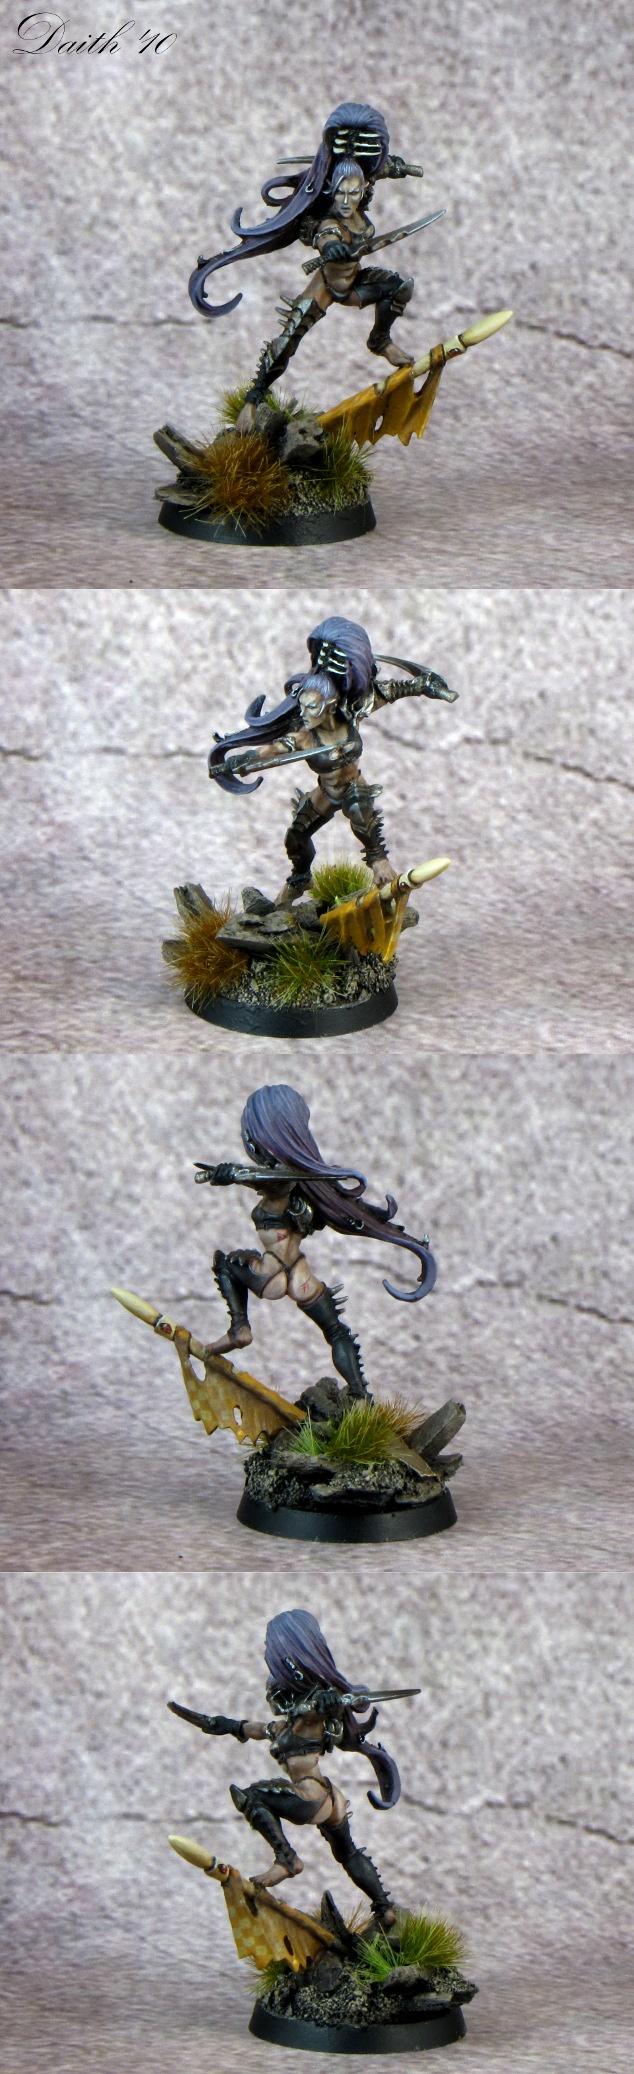 Lilith Hesperax